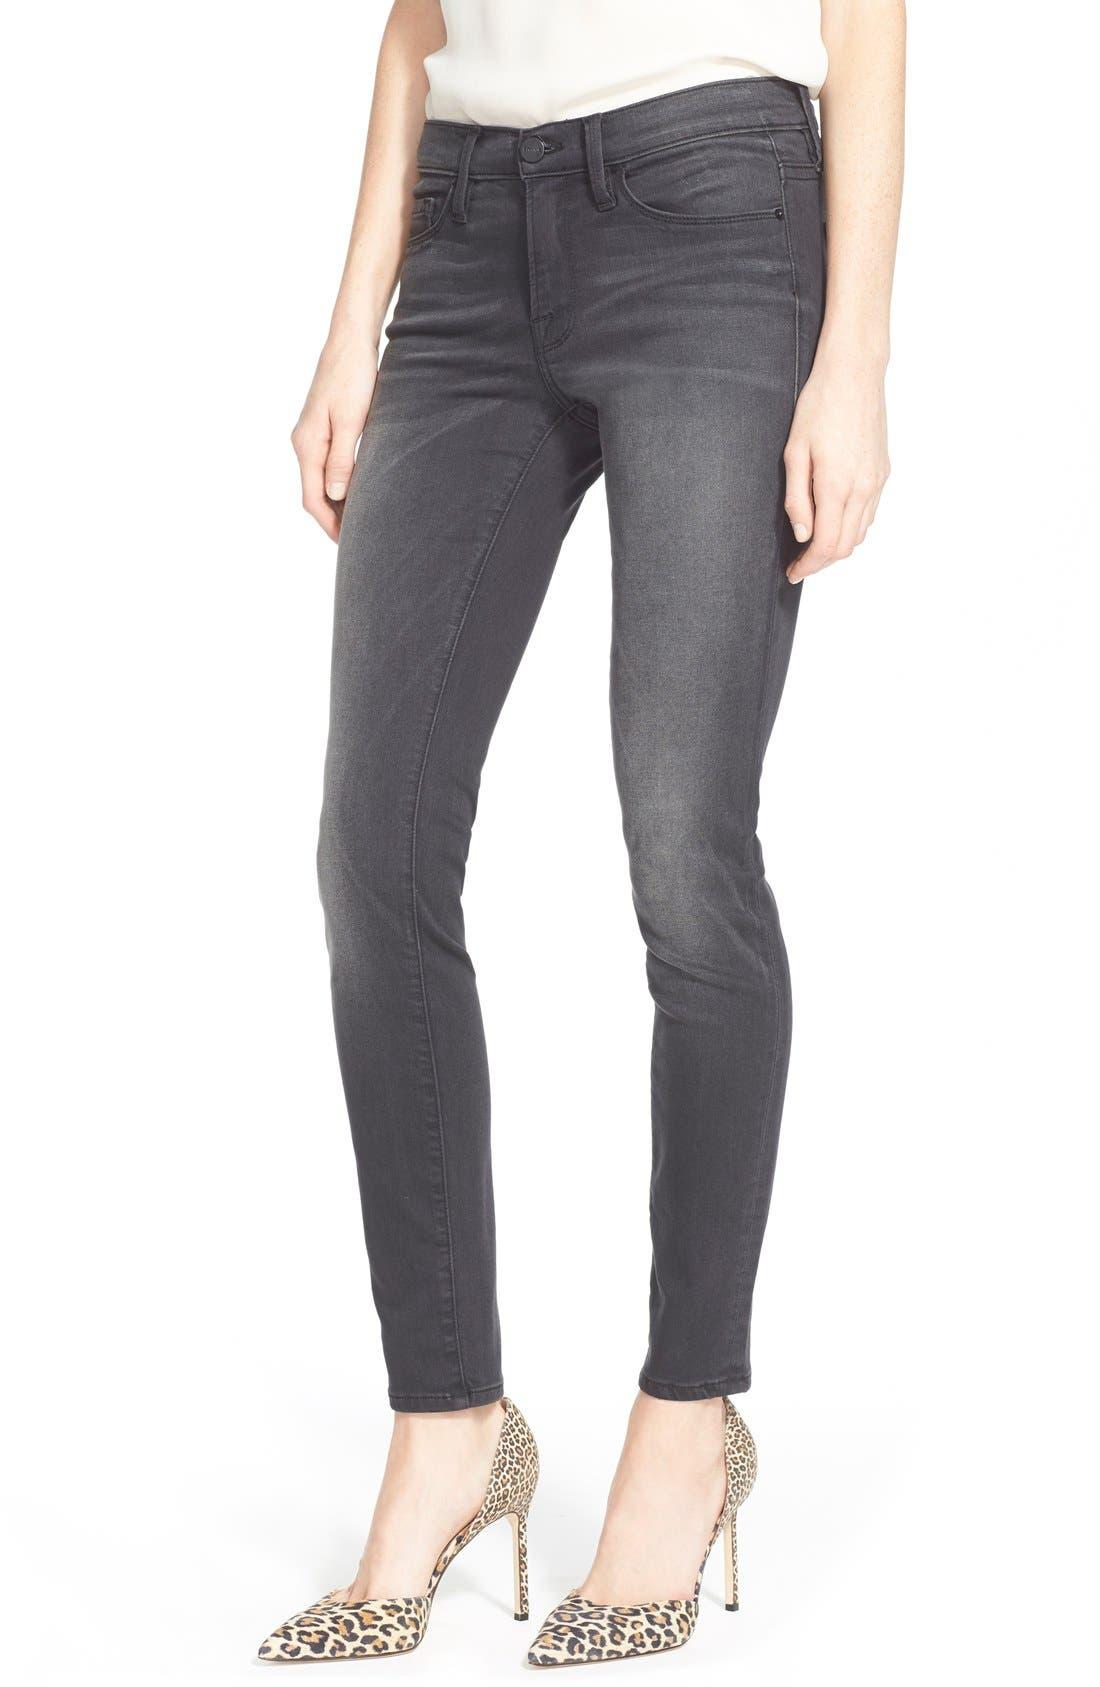 Alternate Image 1 Selected - FRAME 'Le Skinny' Sateen Skinny Jeans (Knightrider)